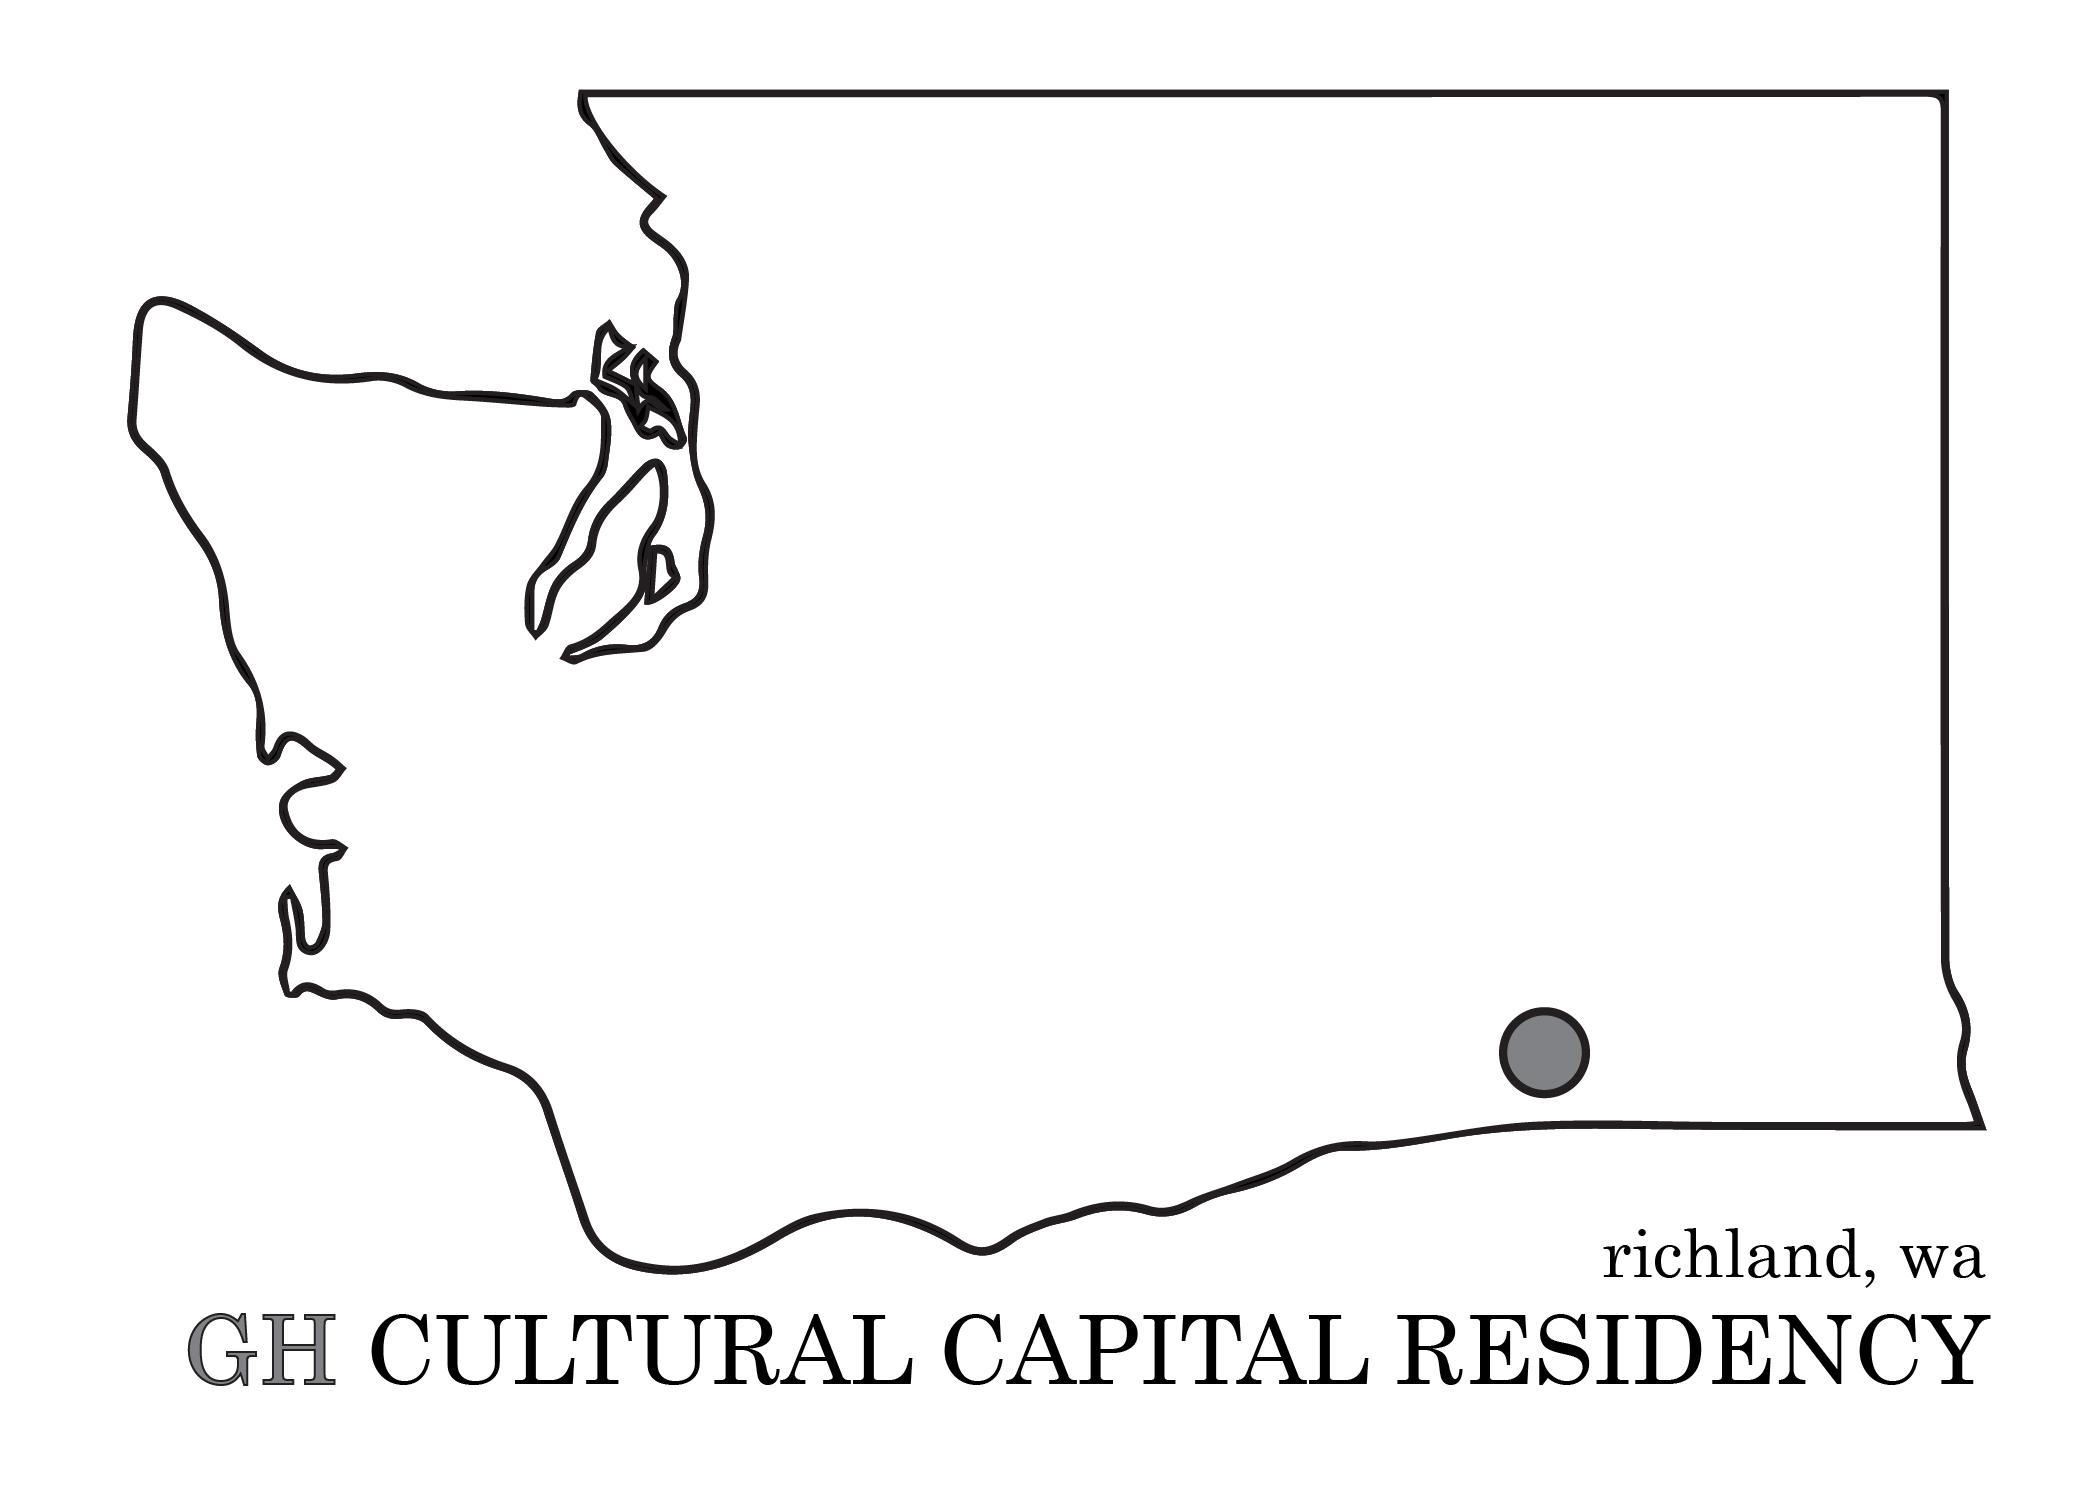 GH Cultural Capital Residency